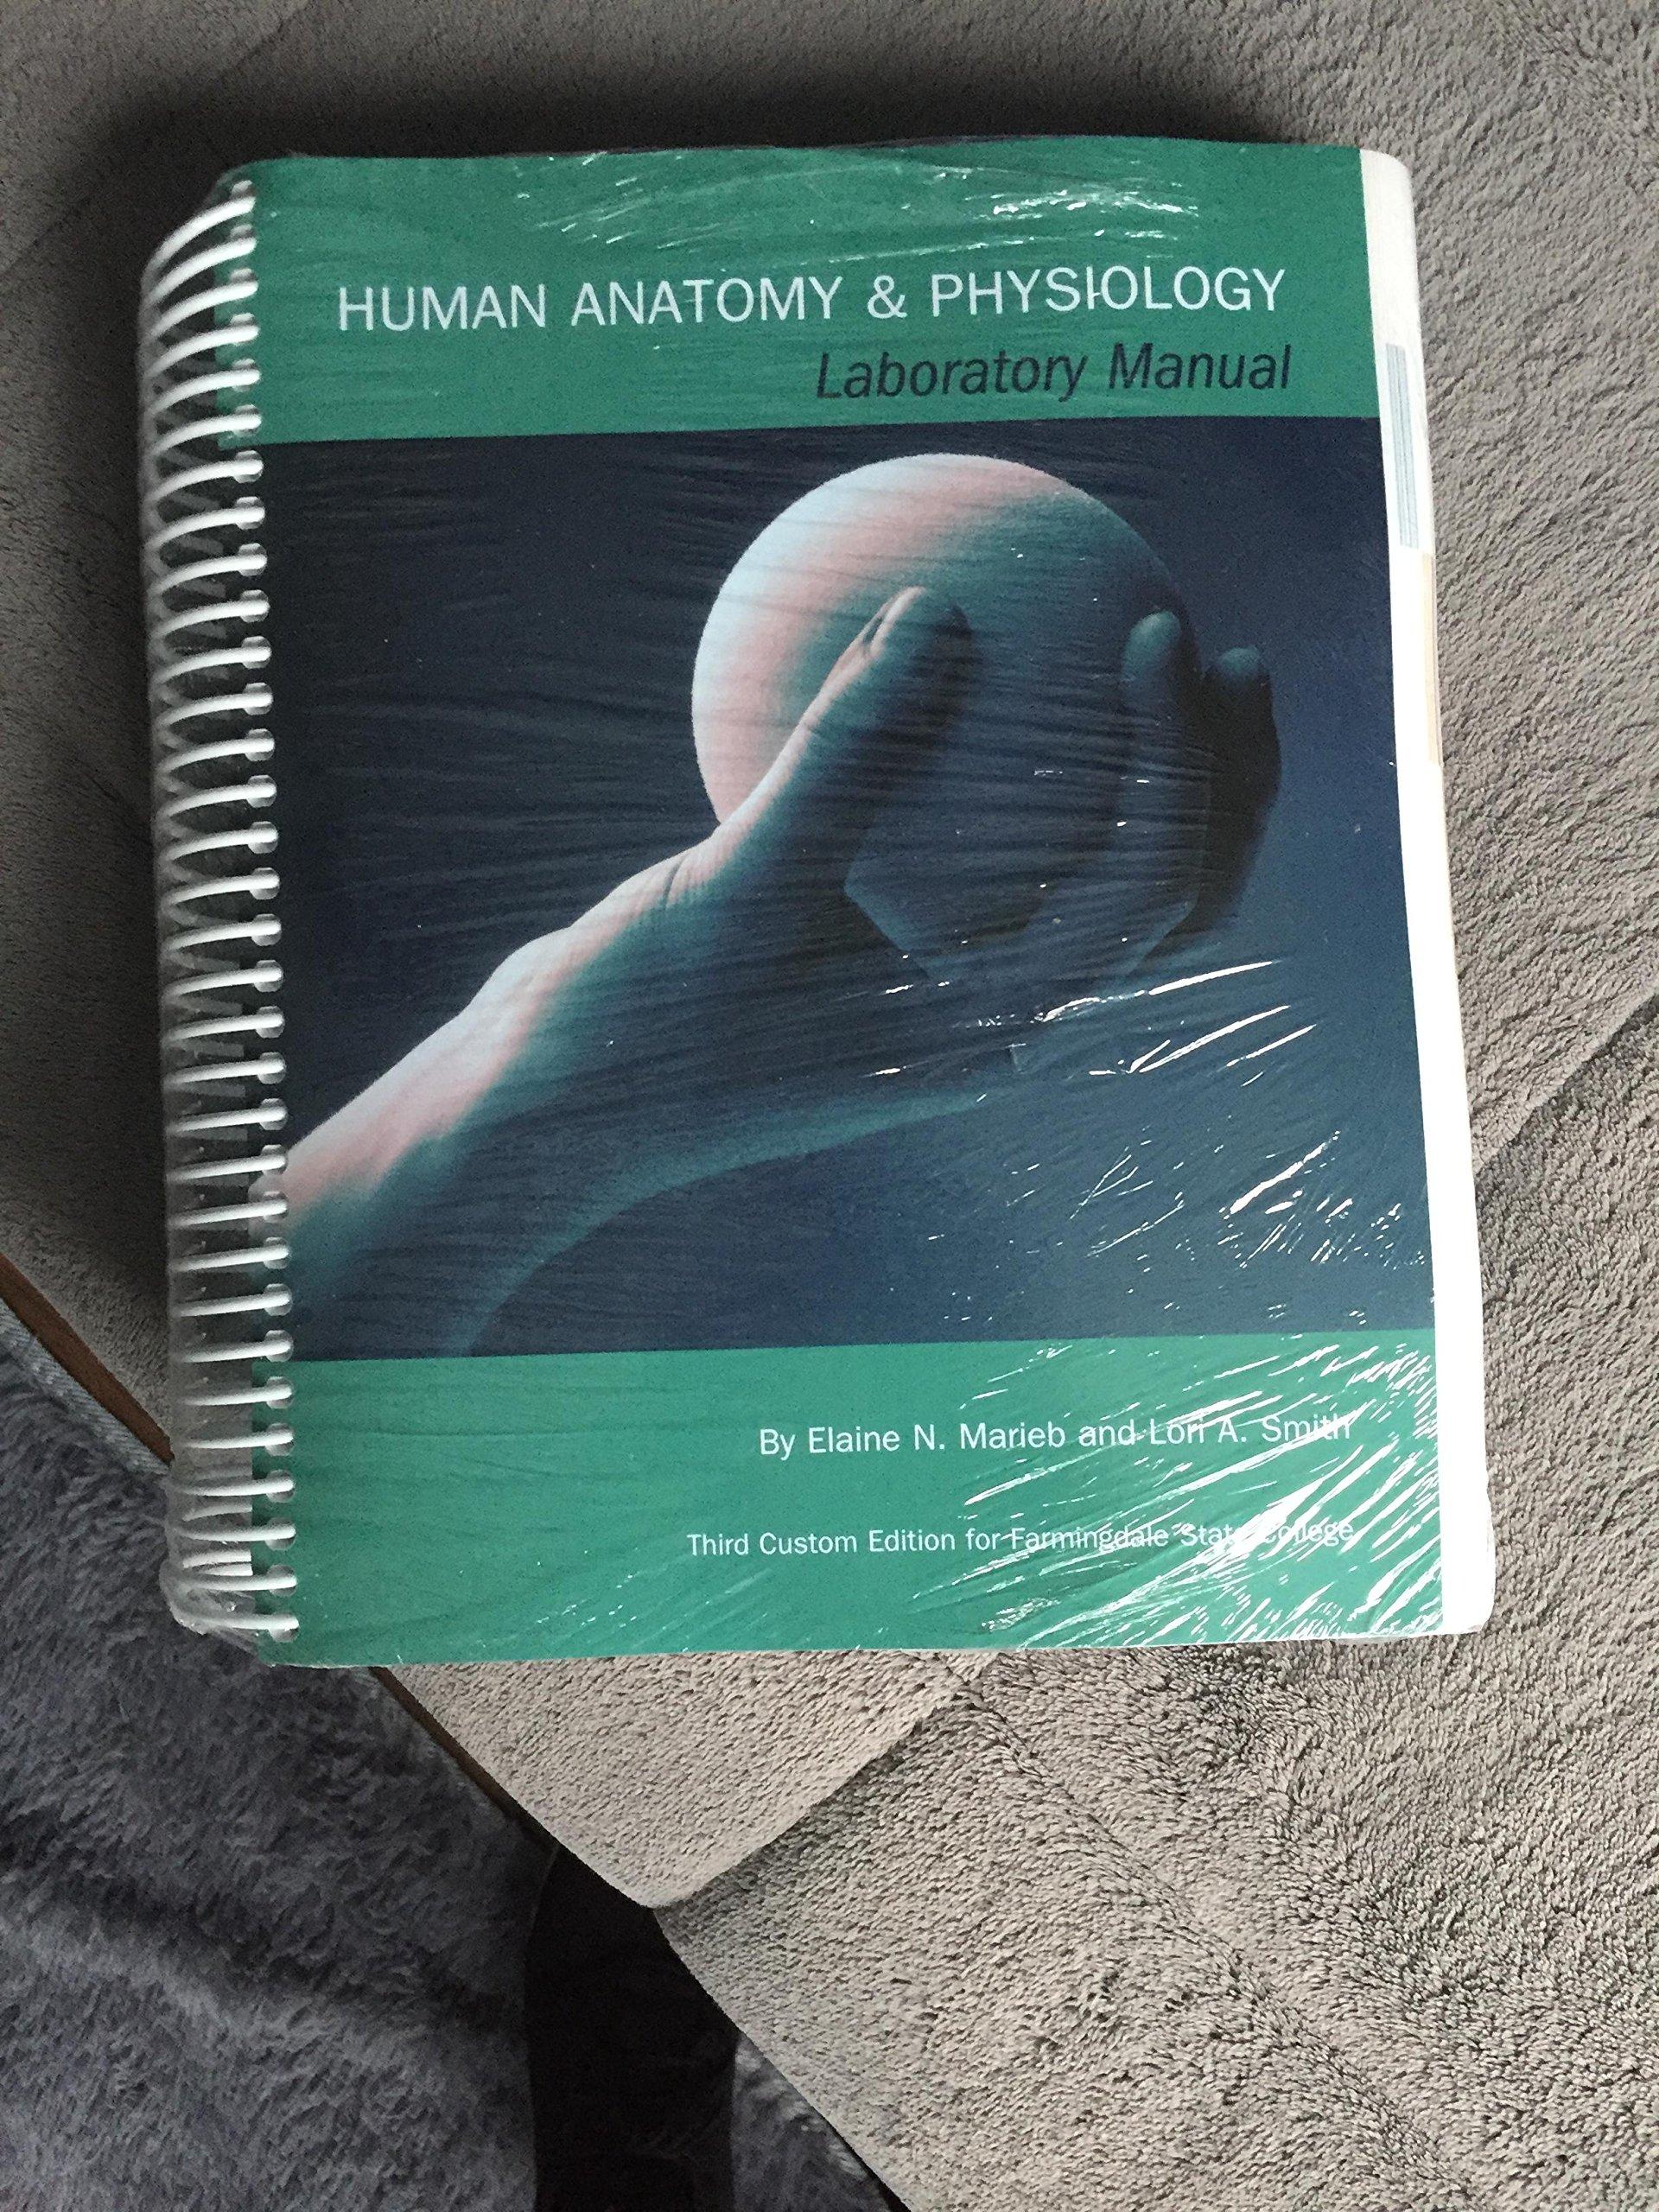 Human Anatomy & Physiology Lab Manual: Elaine N. Marieb, Lori A. Smith:  9781323146408: Amazon.com: Books